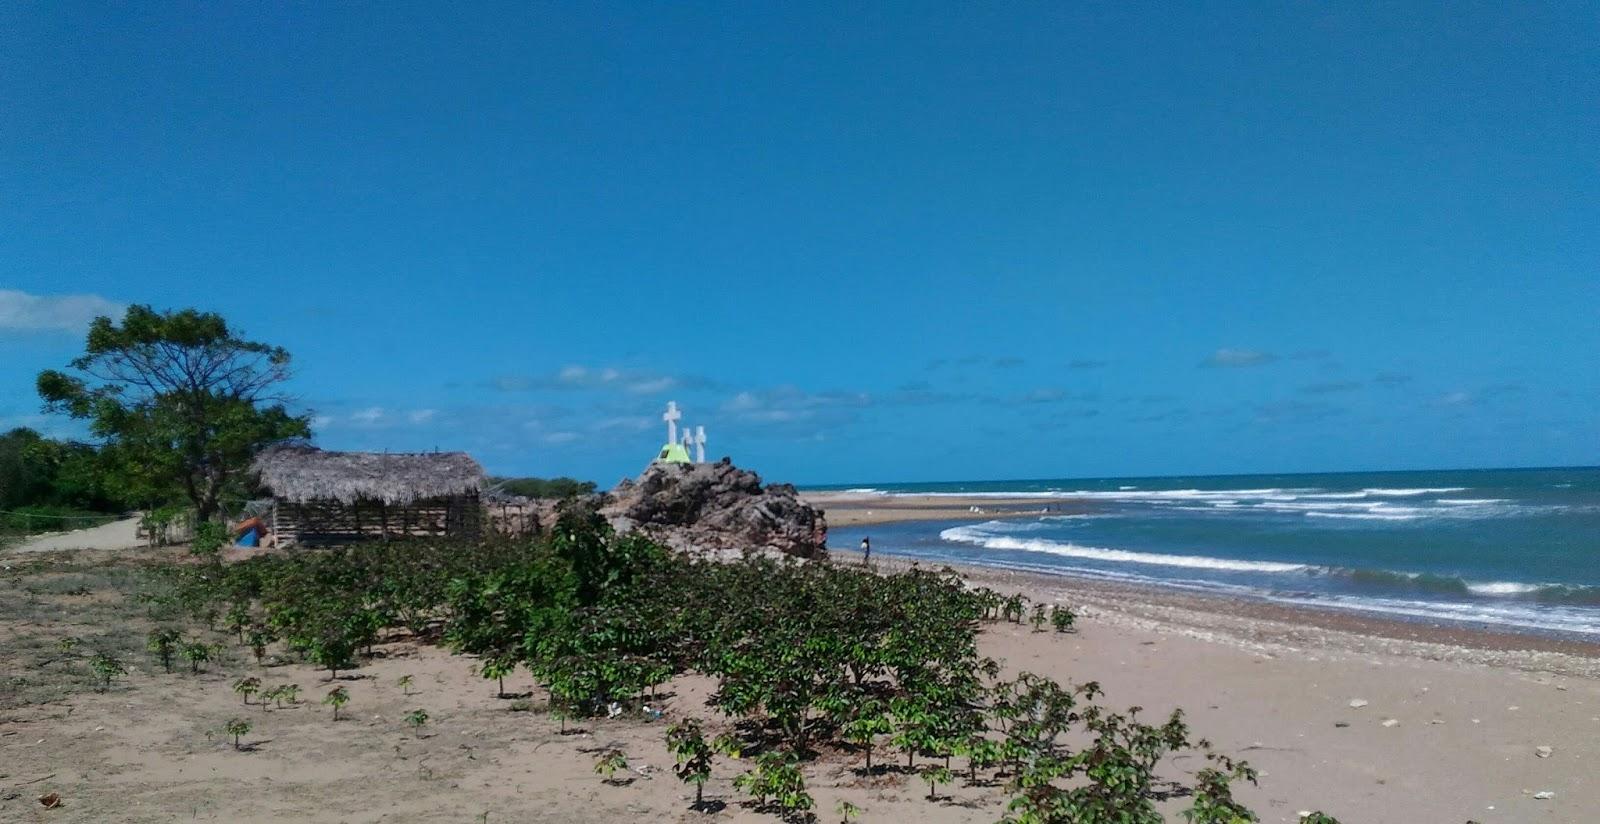 Arianto Ntt Pantai Batu Lesa Kabupaten Kupang Taman Beramain Boneana